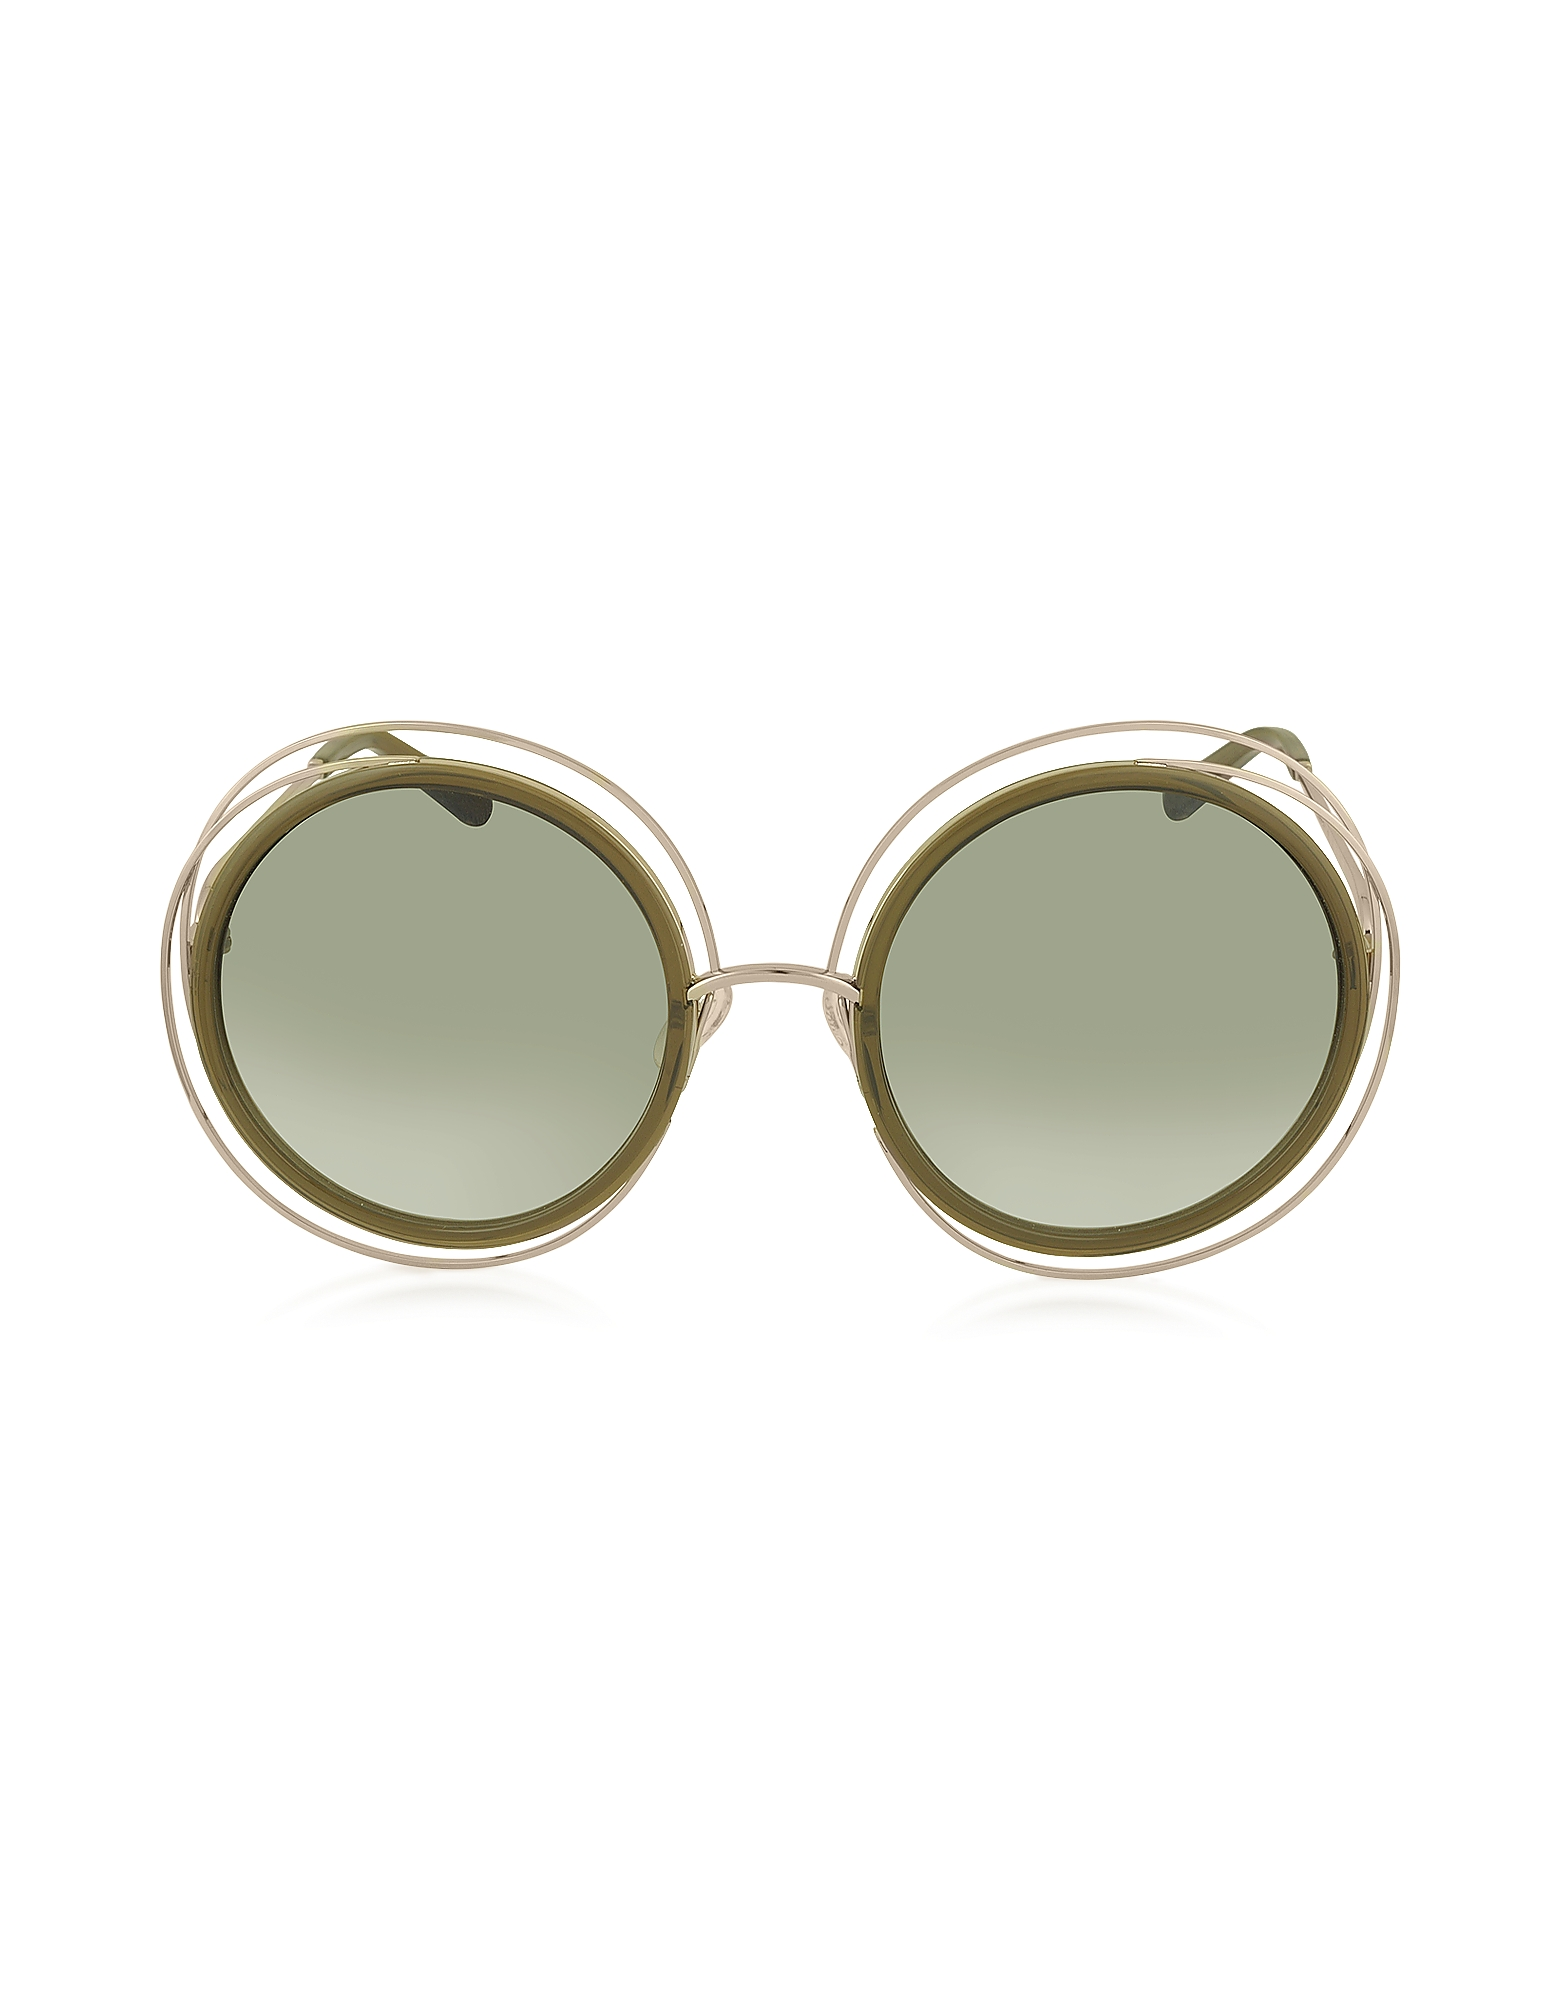 Chloe Sunglasses, CARLINA CE 120S Round Oversized Acetate & Metal Women's Sunglasses